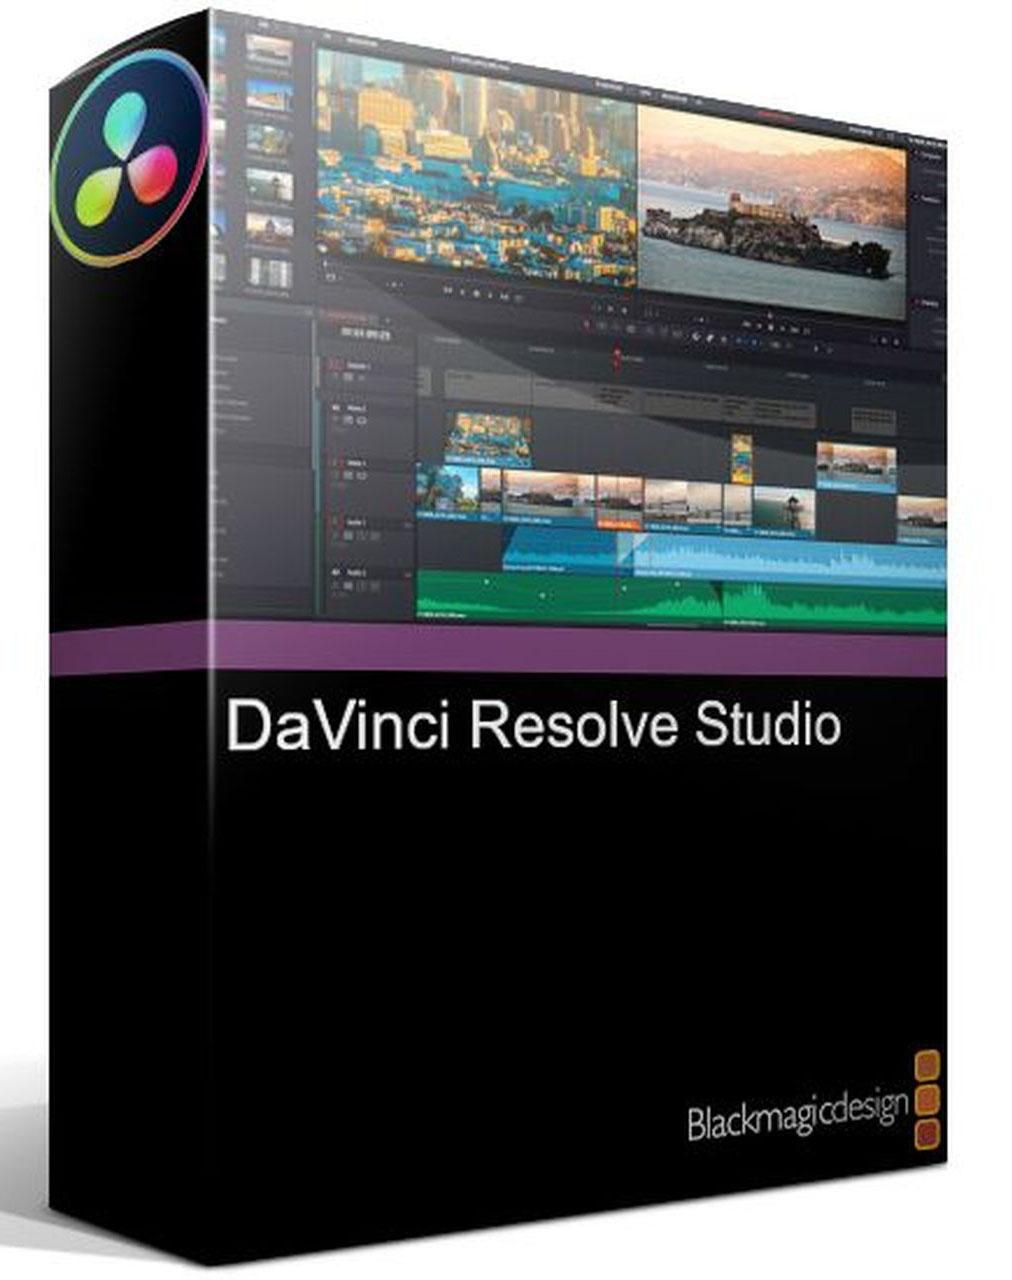 Blackmagic Design Davinci Resolve Studio 16 2 7 8 Crack Free Download Mac Software Download